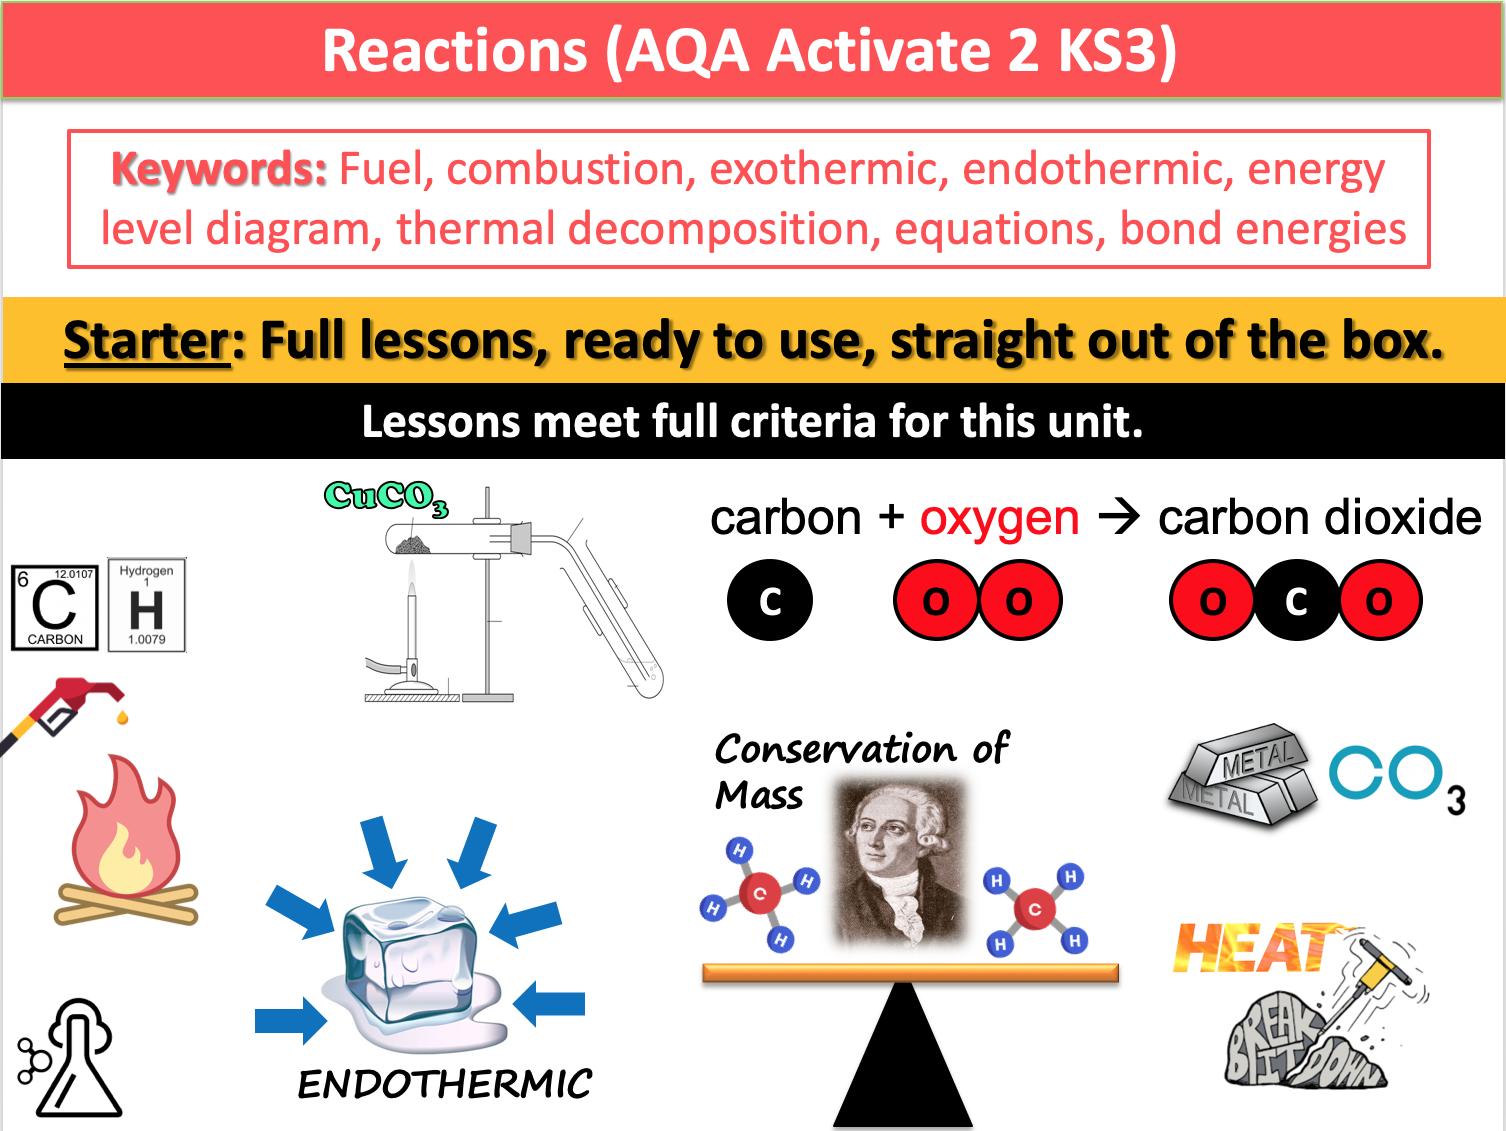 Reactions (AQA Activate 2 KS3)